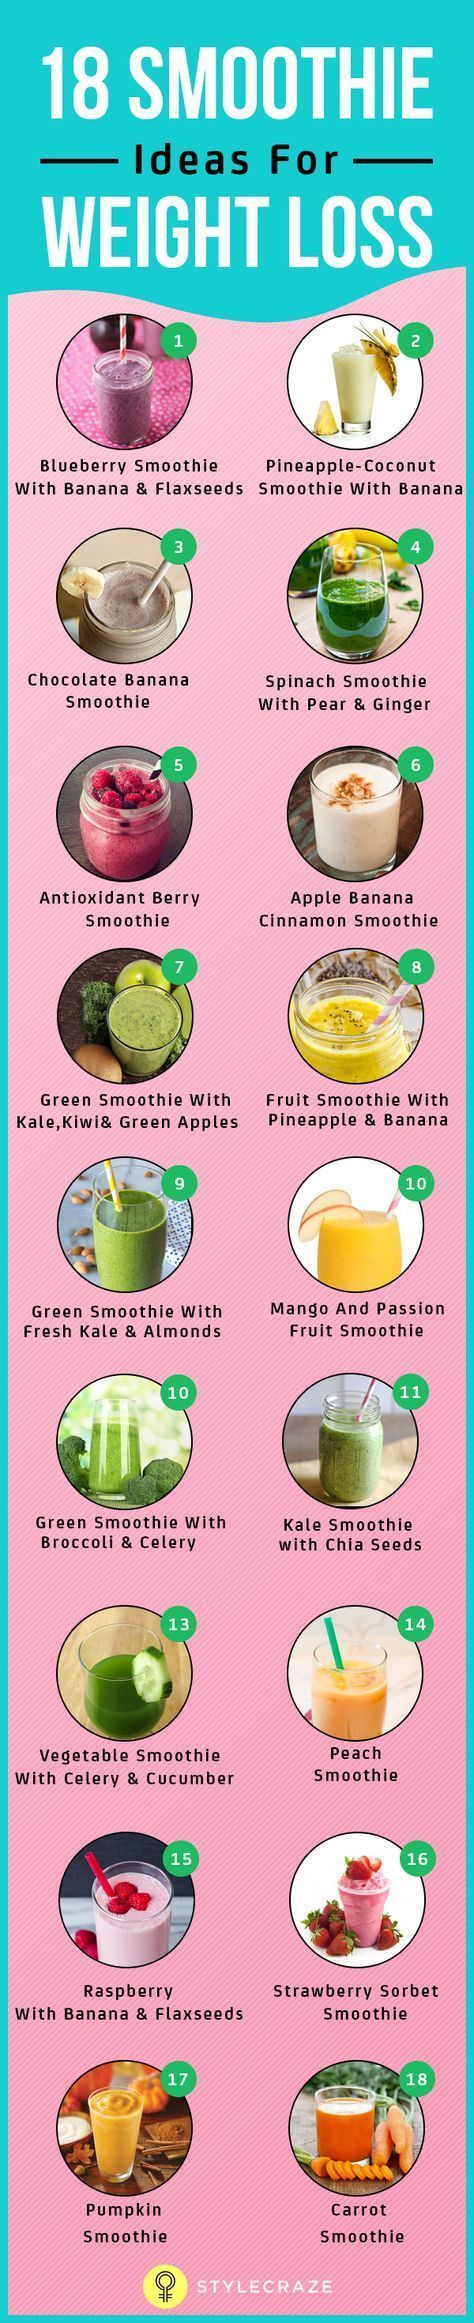 Foods that help burn tummy fat